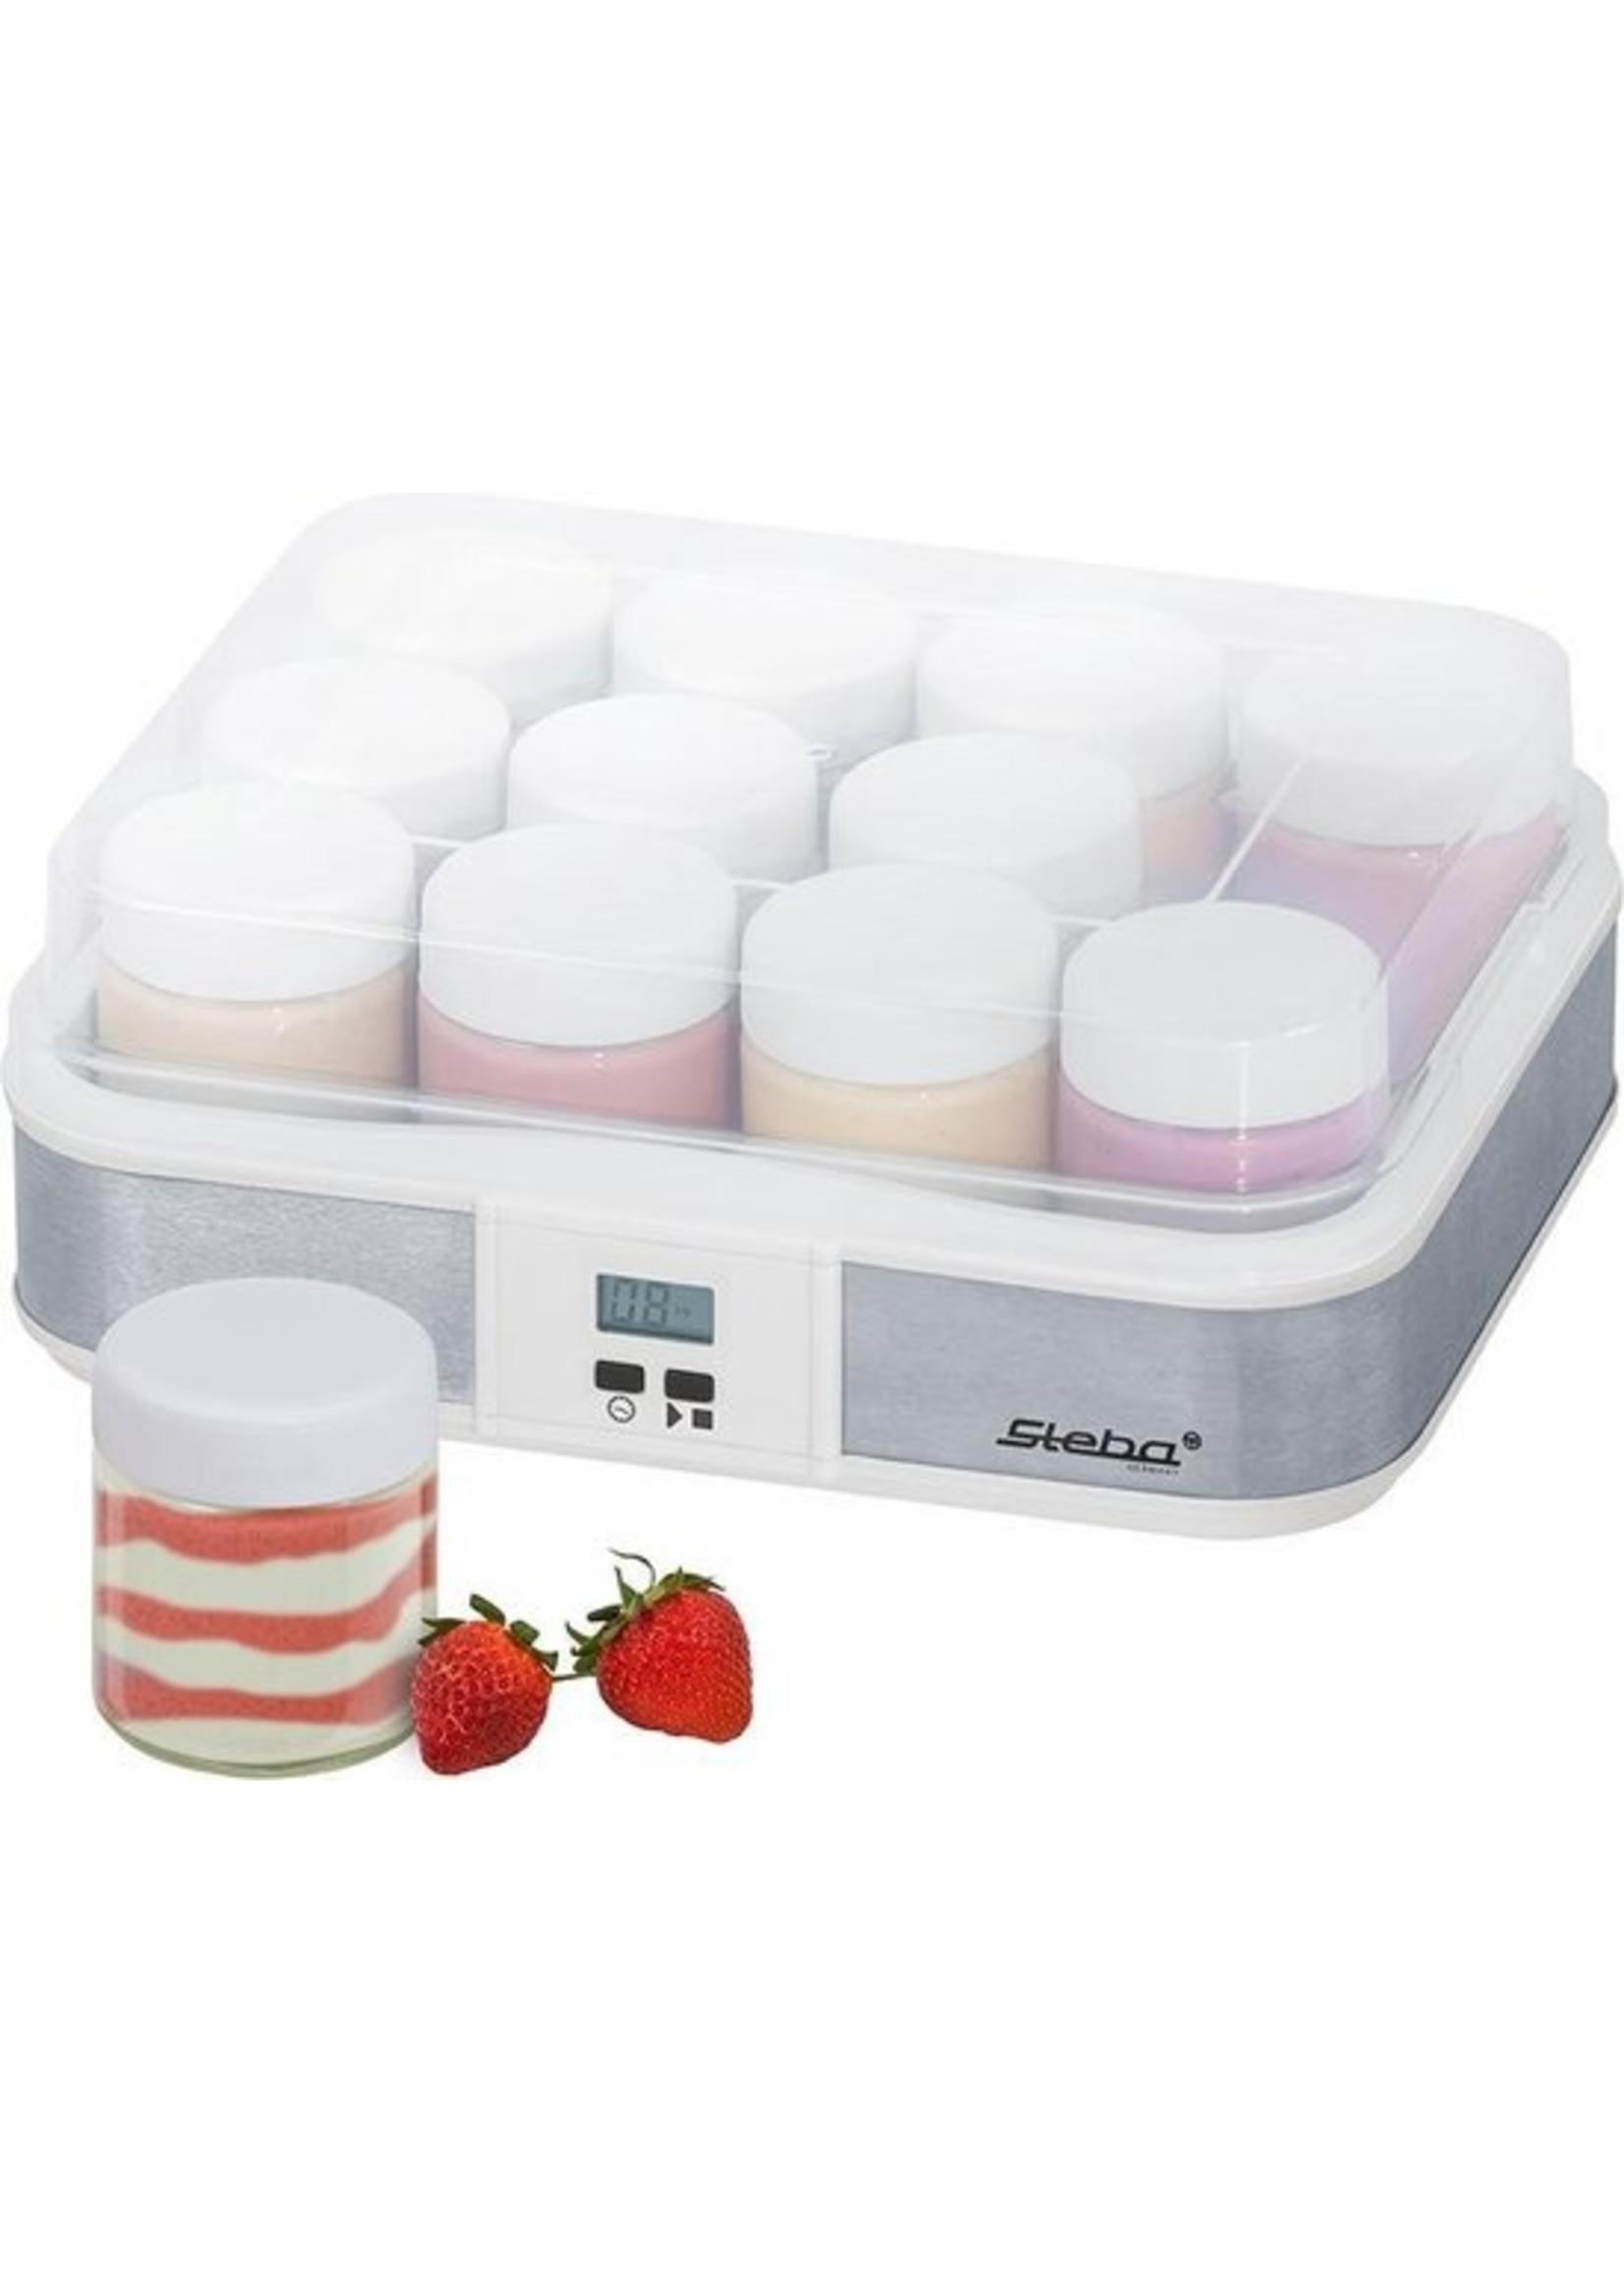 Steba Steba JM2 - Yoghurtmaker 12x210 ml - RVS koopjeshoek